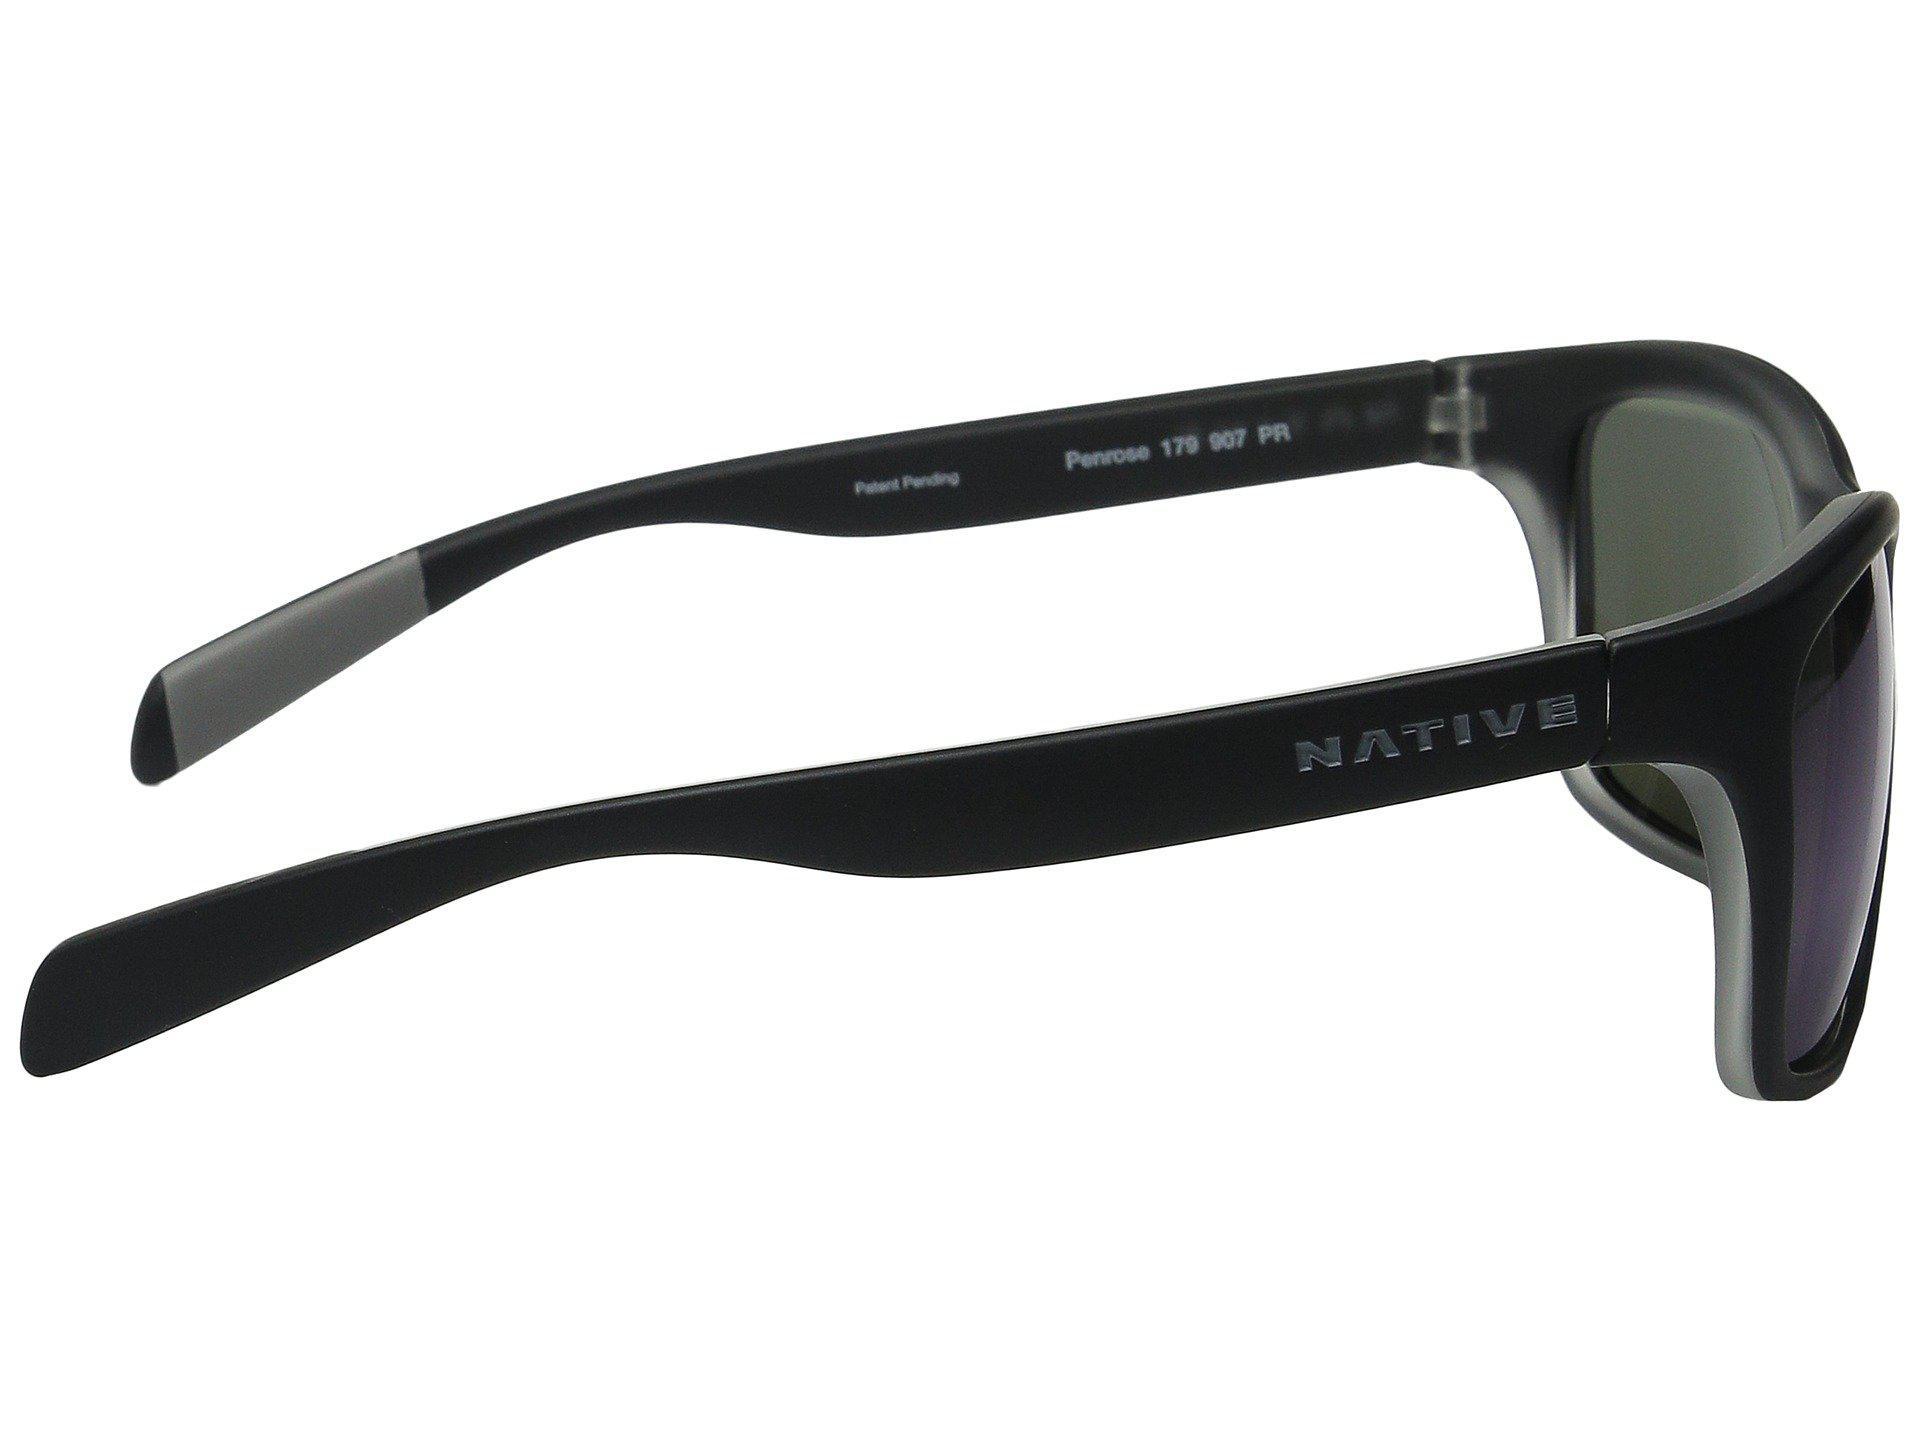 dc3e335e62 Lyst - Native Eyewear Penrose (wood black) Sport Sunglasses in Blue